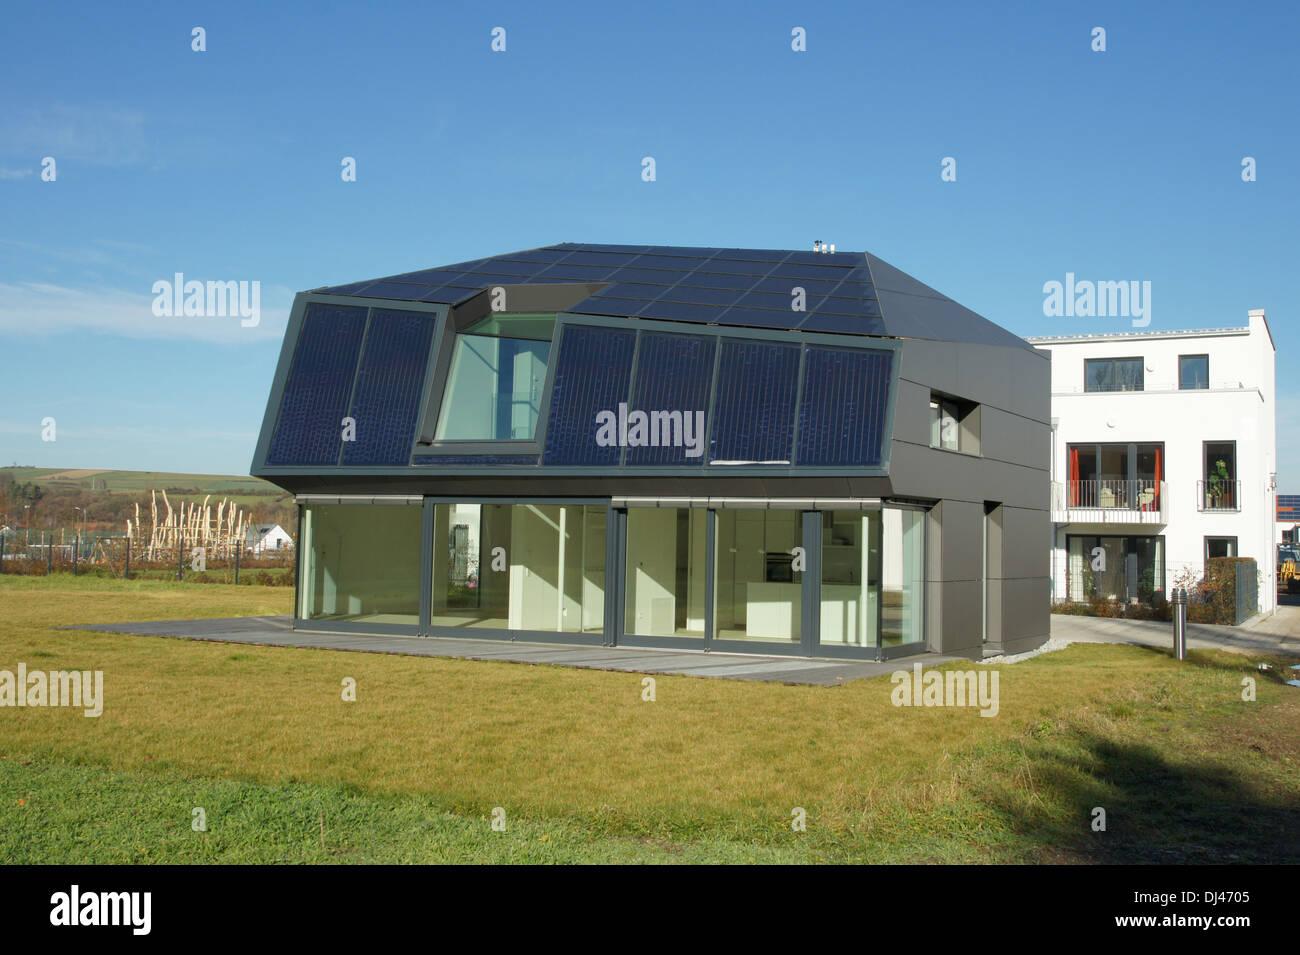 Nullenergiehaus - Stock Image